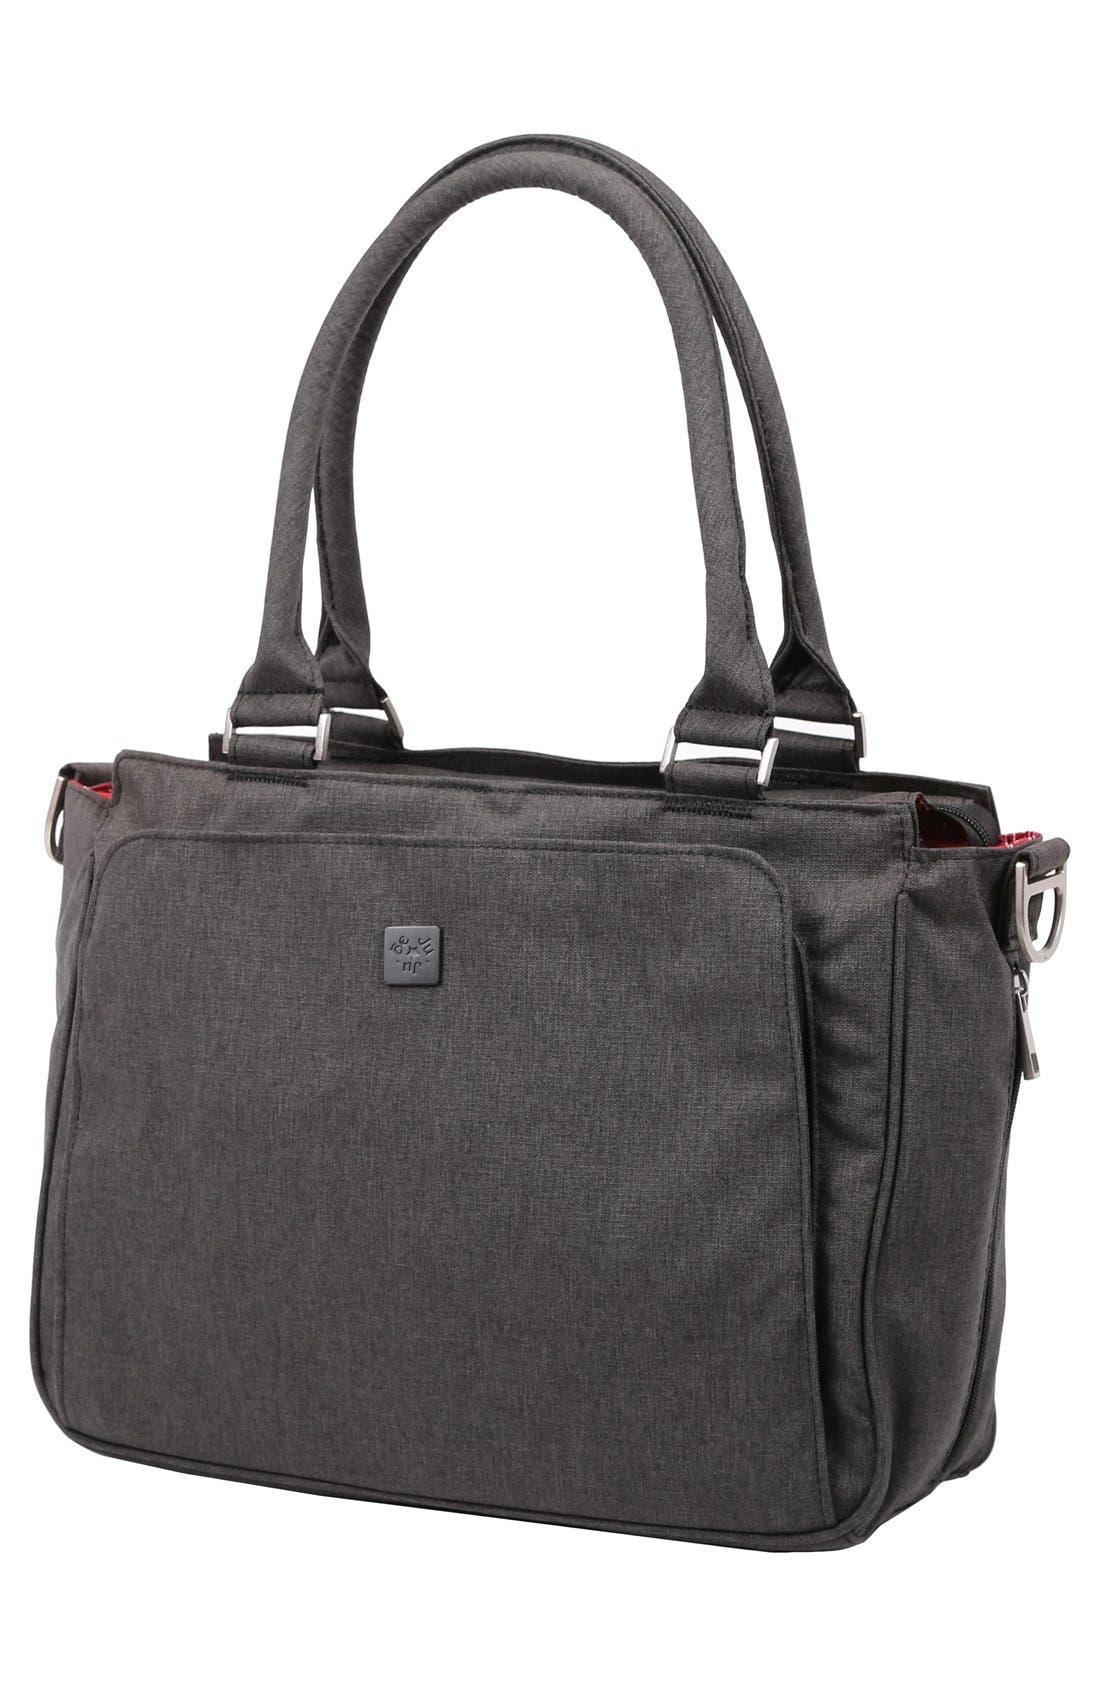 'Be Classy - Onyx Collection' Messenger Diaper Bag,                             Alternate thumbnail 5, color,                             Chrome